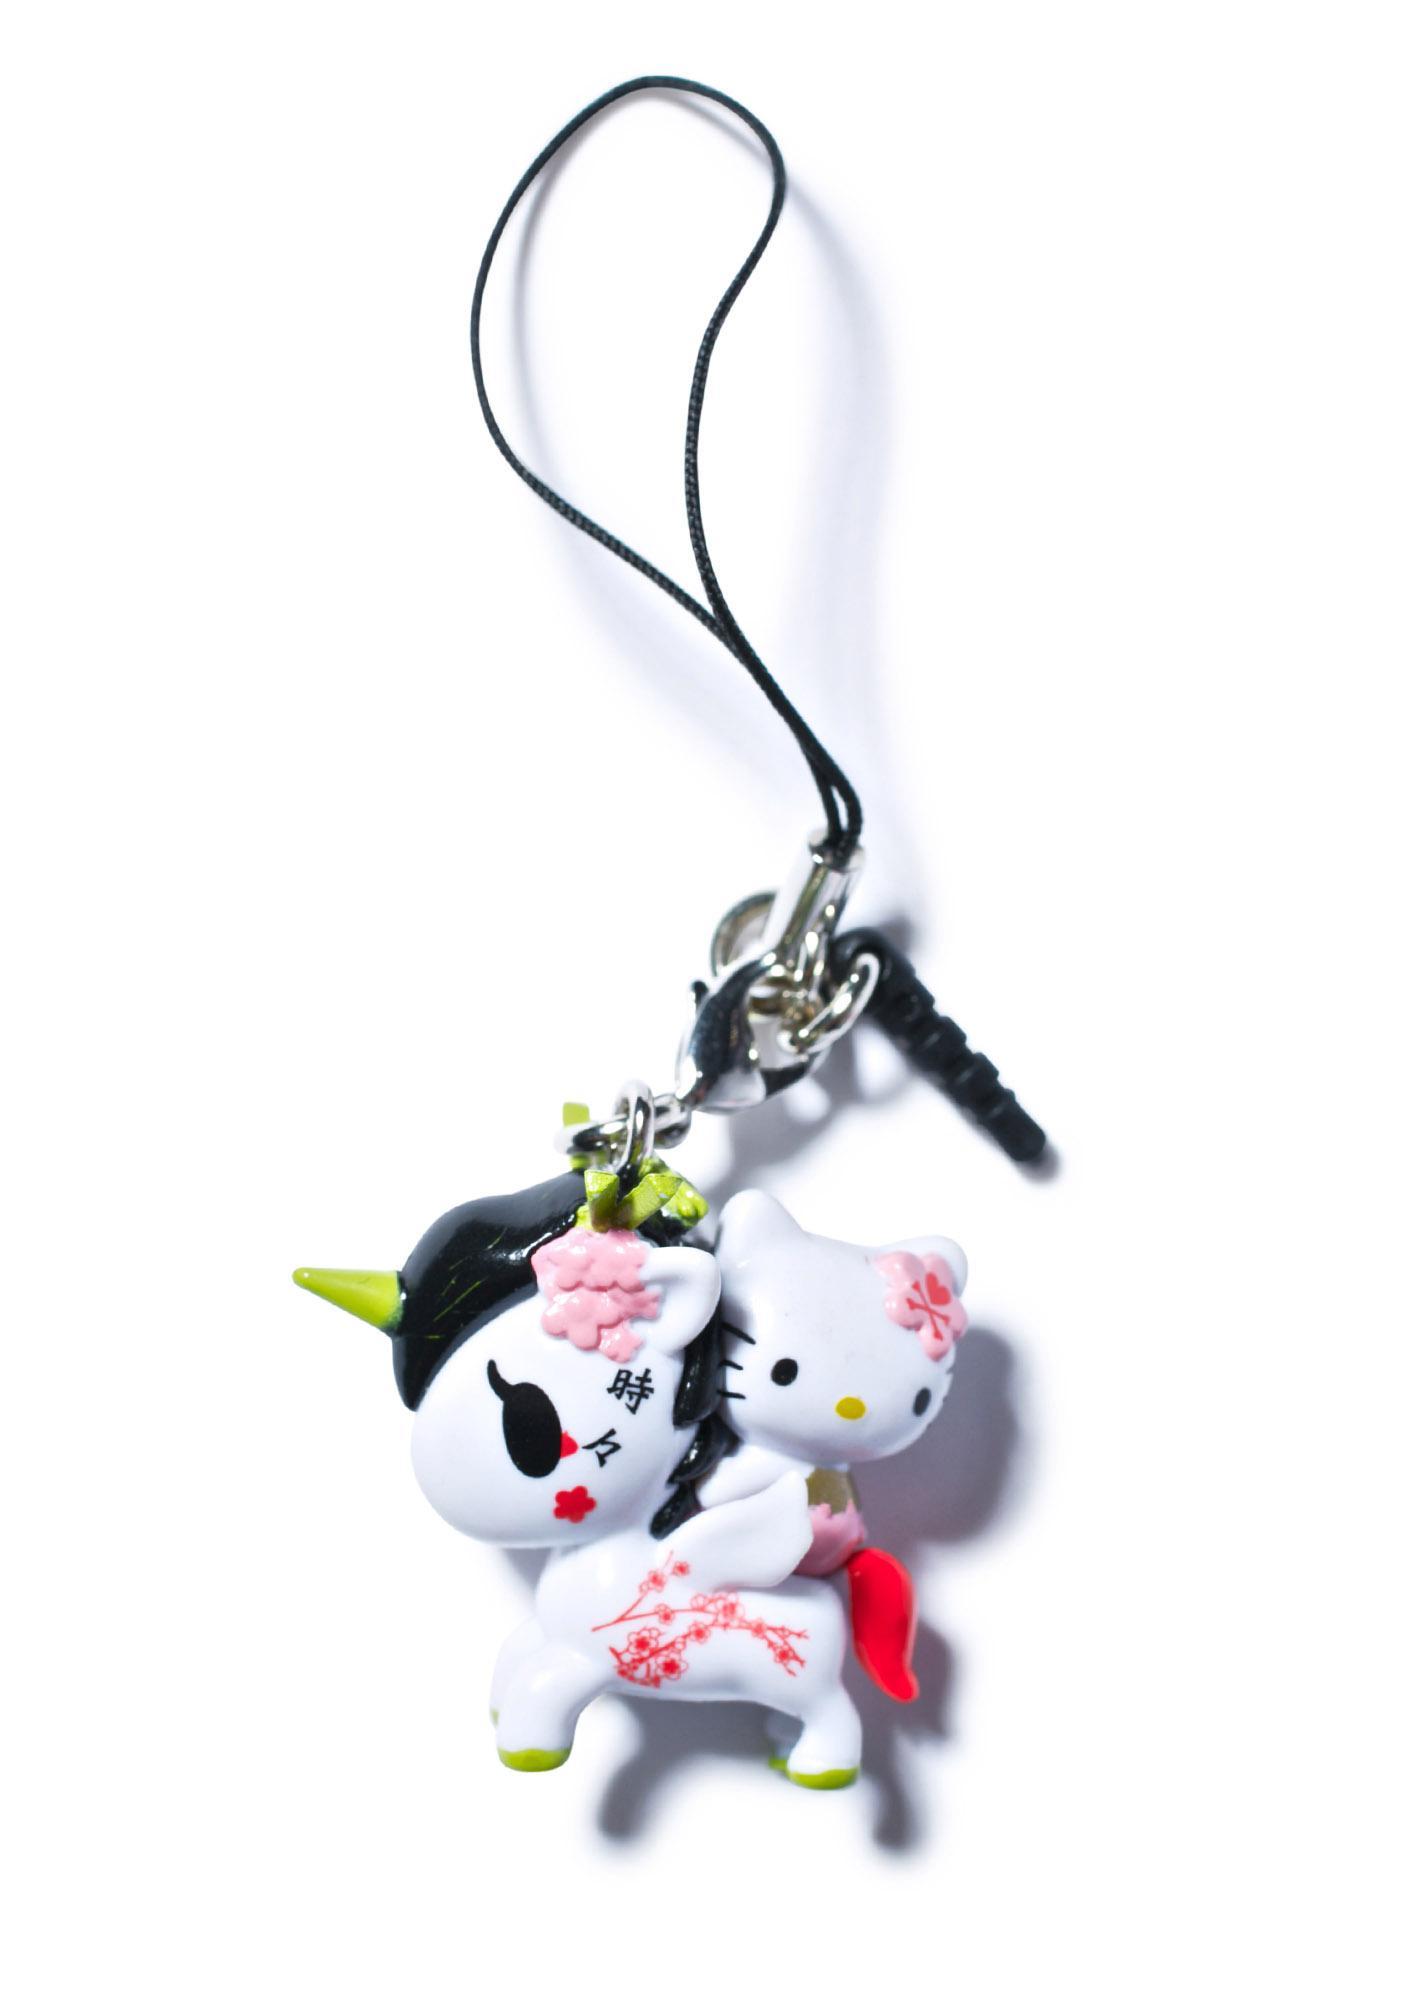 Tokidoki Unicorno Frenzies x Hello Kitty Blind Box